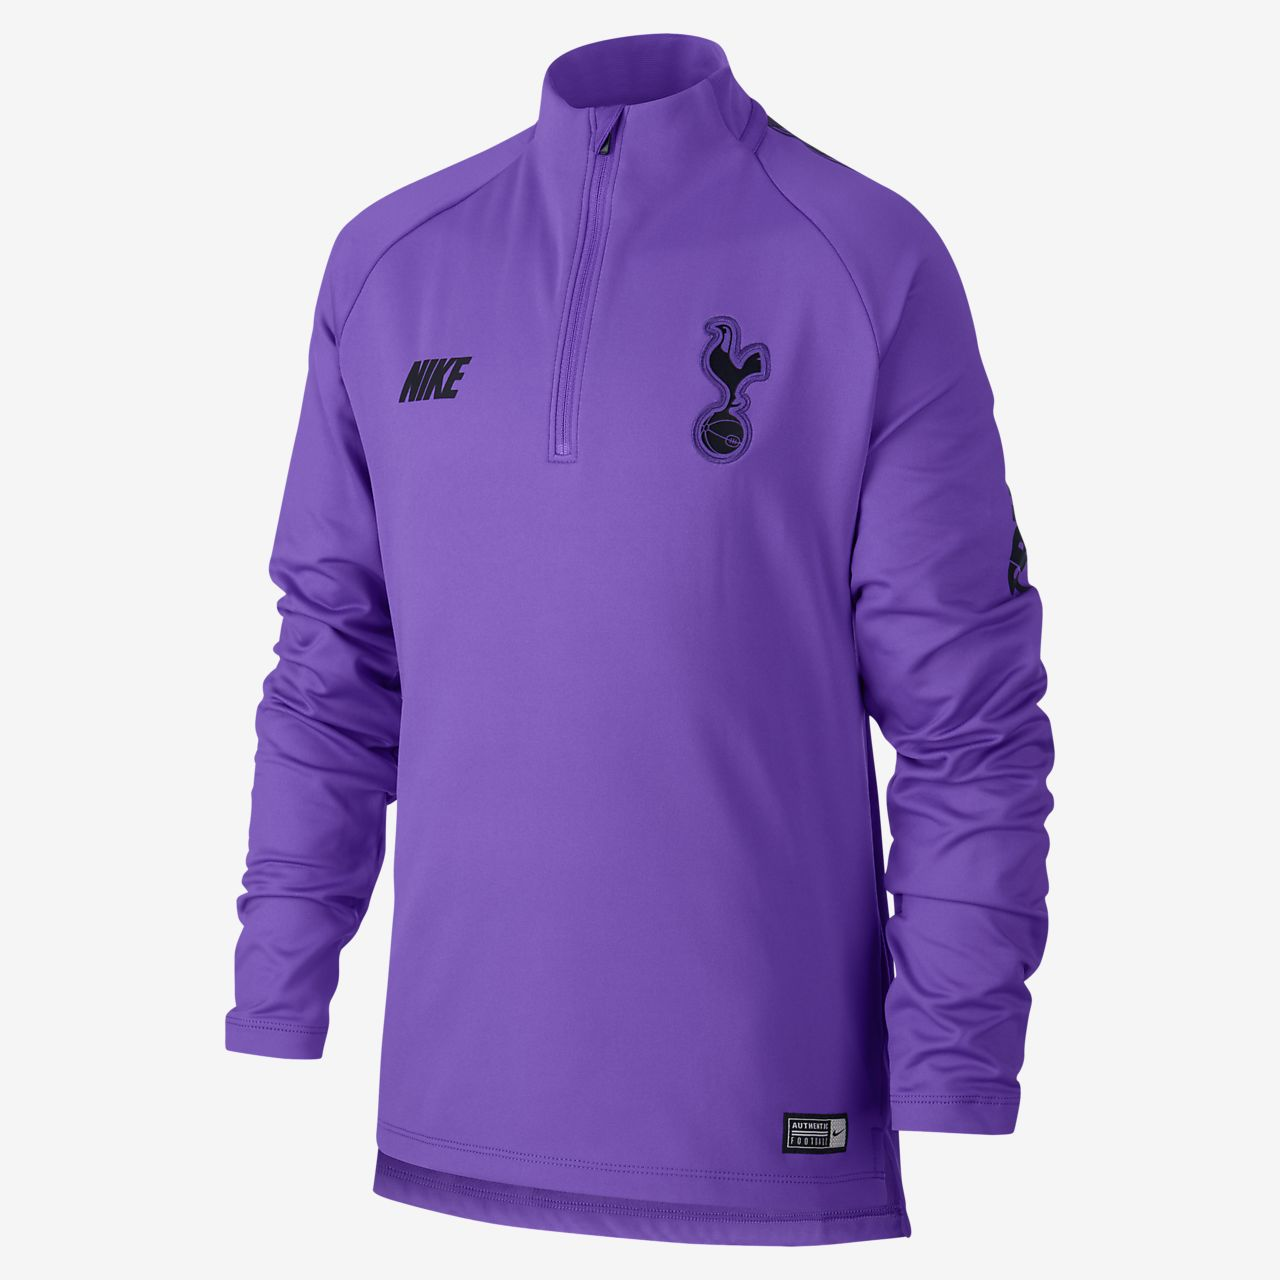 Tottenham Hotspur Dri-FIT Squad Drill Camiseta de fútbol de manga larga - Niño/a